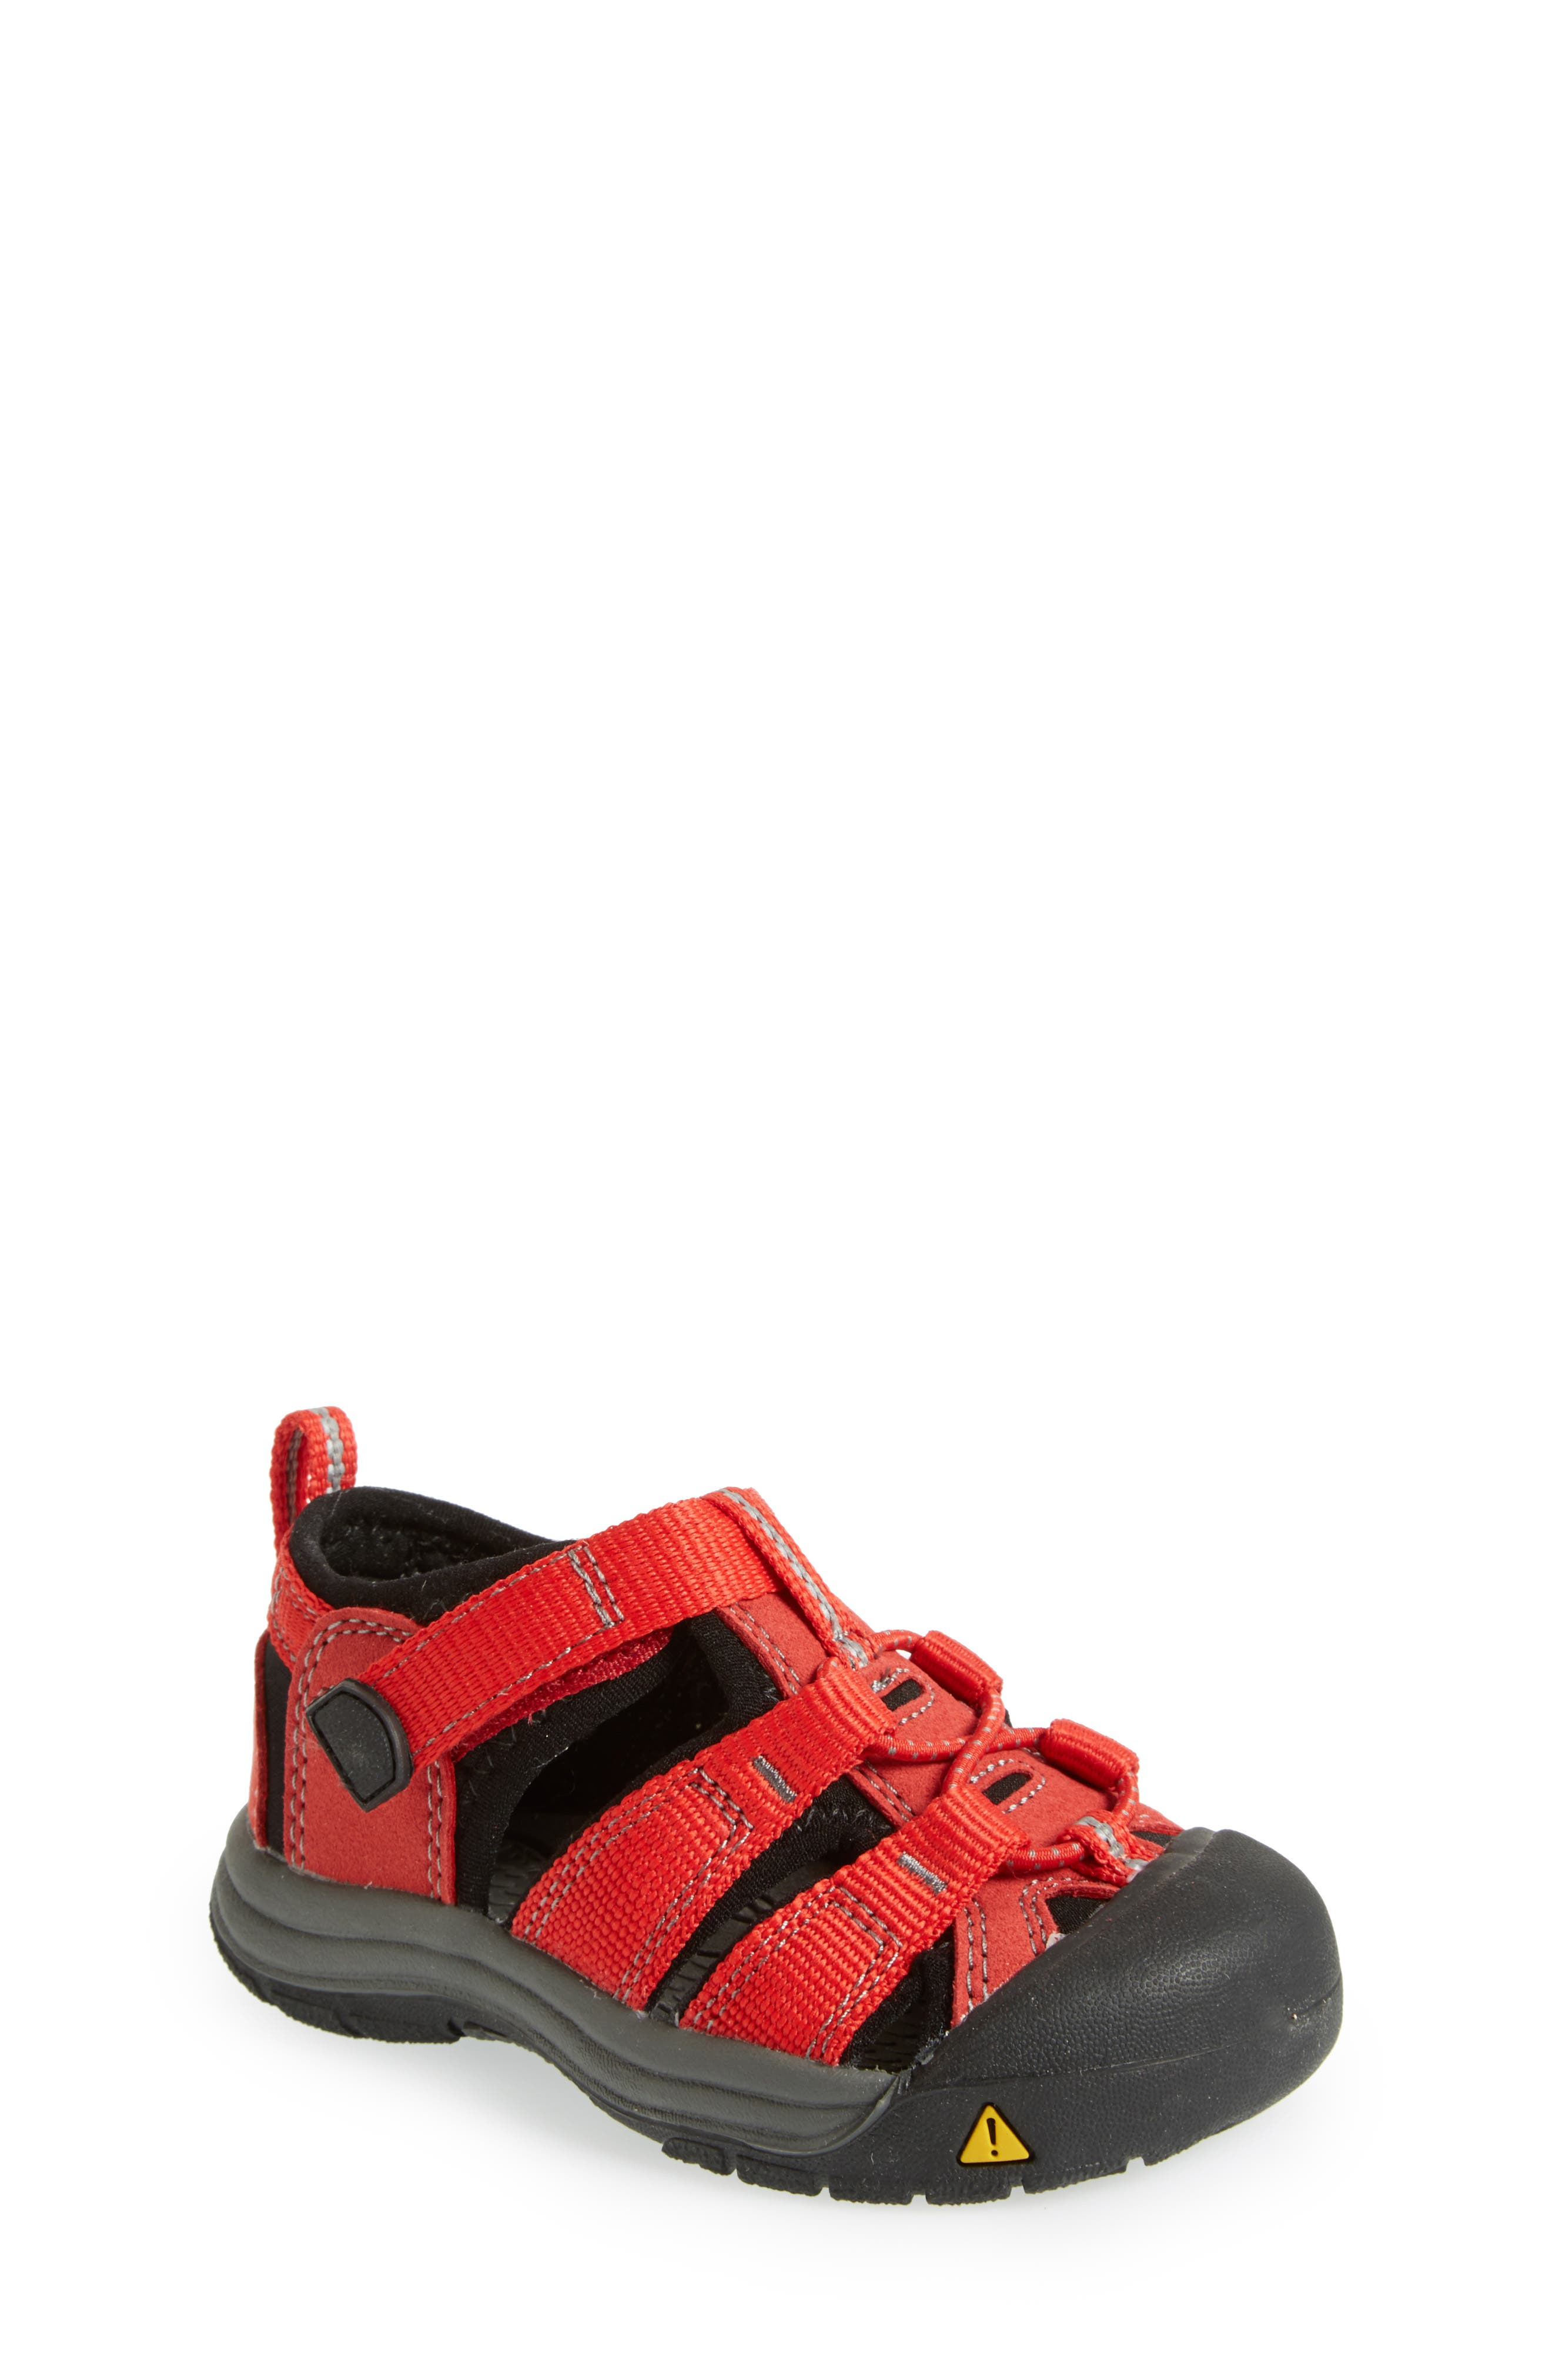 Keen 'Newport H2' Water Friendly Sandal (Baby, Walker, Toddler, Little Kid & Big Kid)